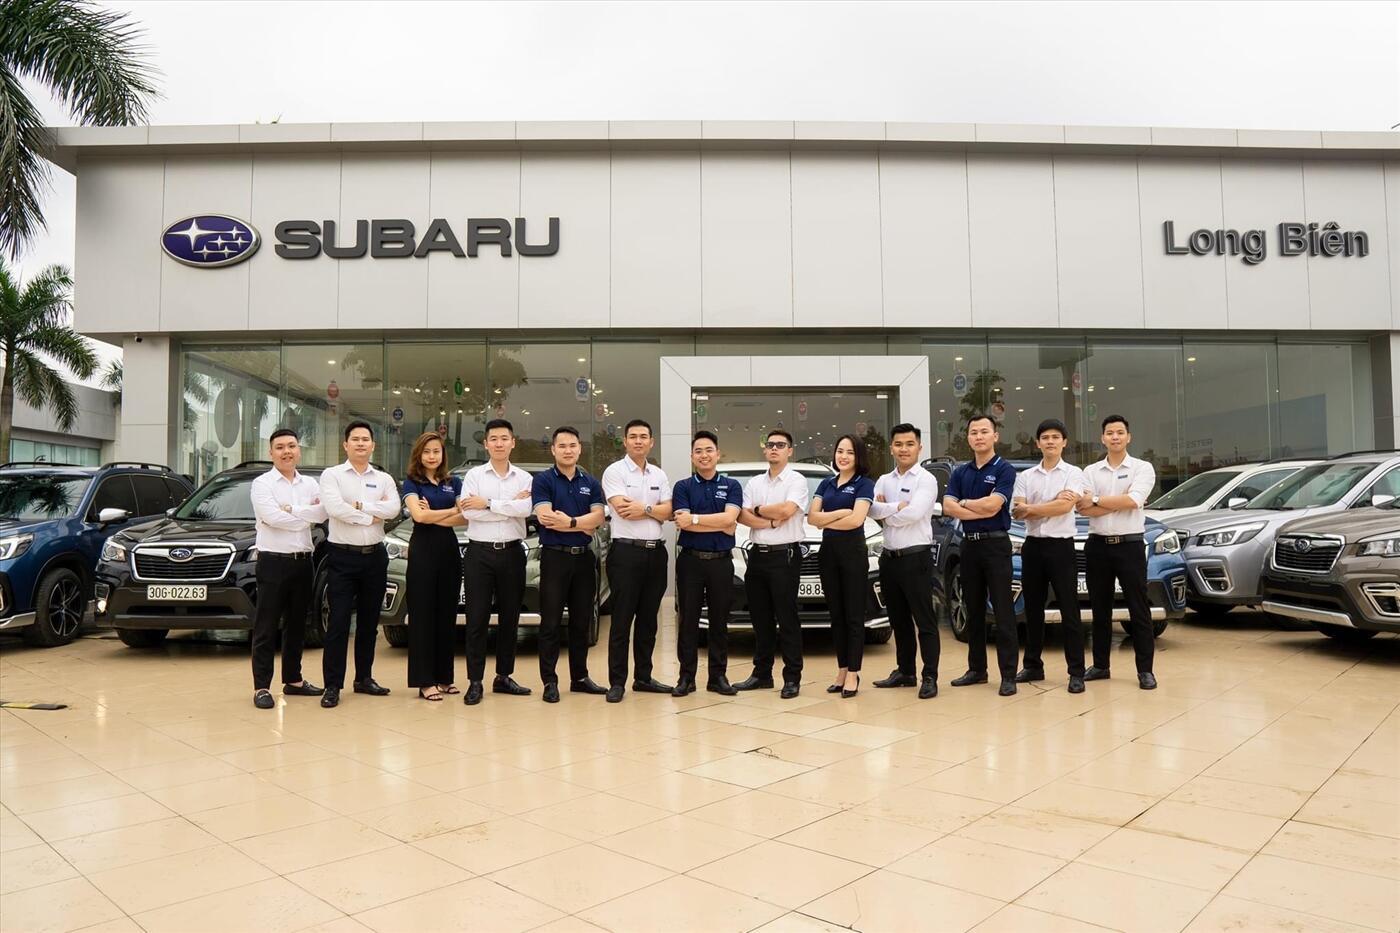 Subaru Long Biên